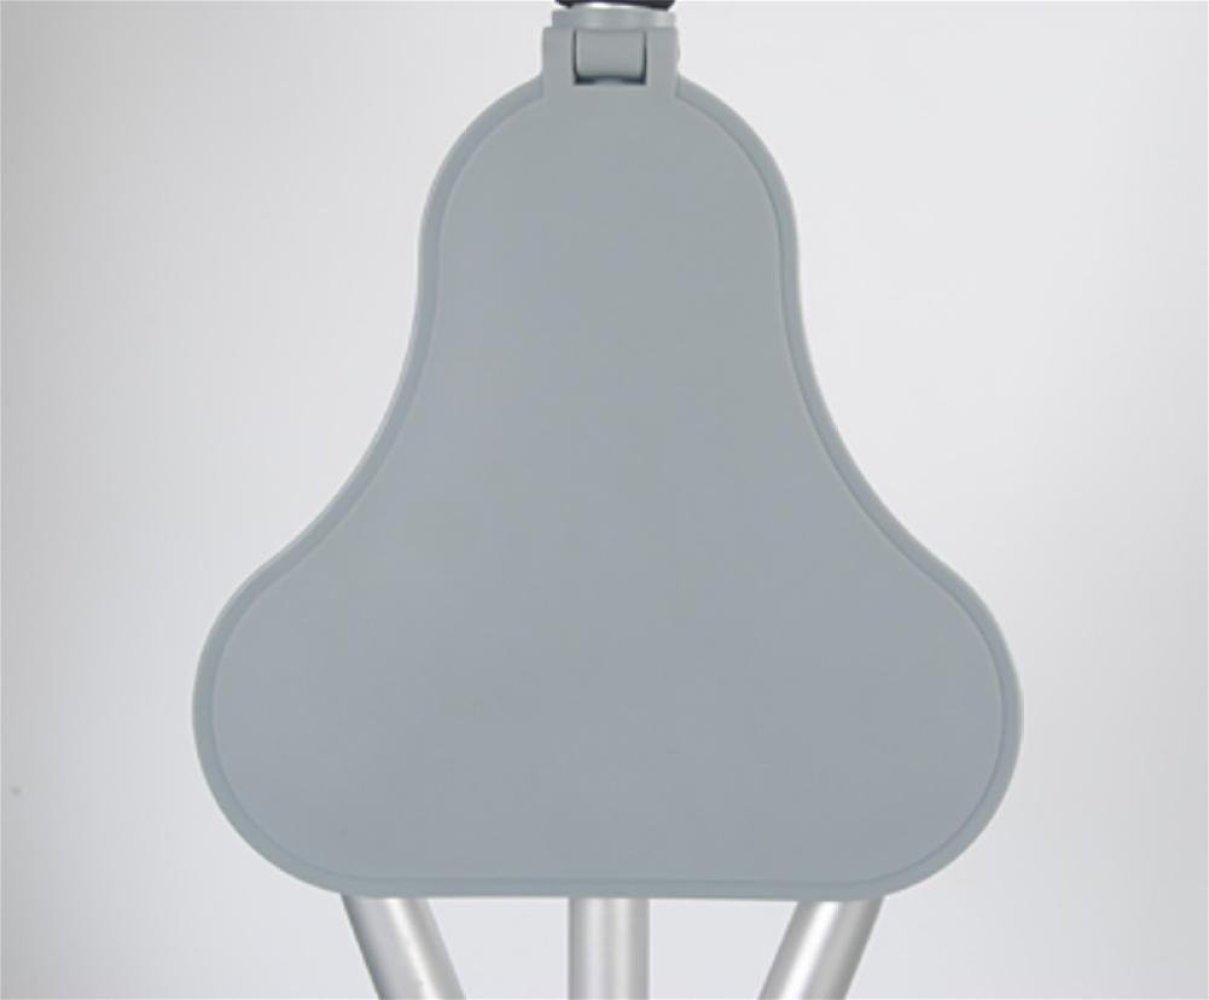 Amazon.com: VGHJK Products Lightweight Travel Seat Plus Cane ...